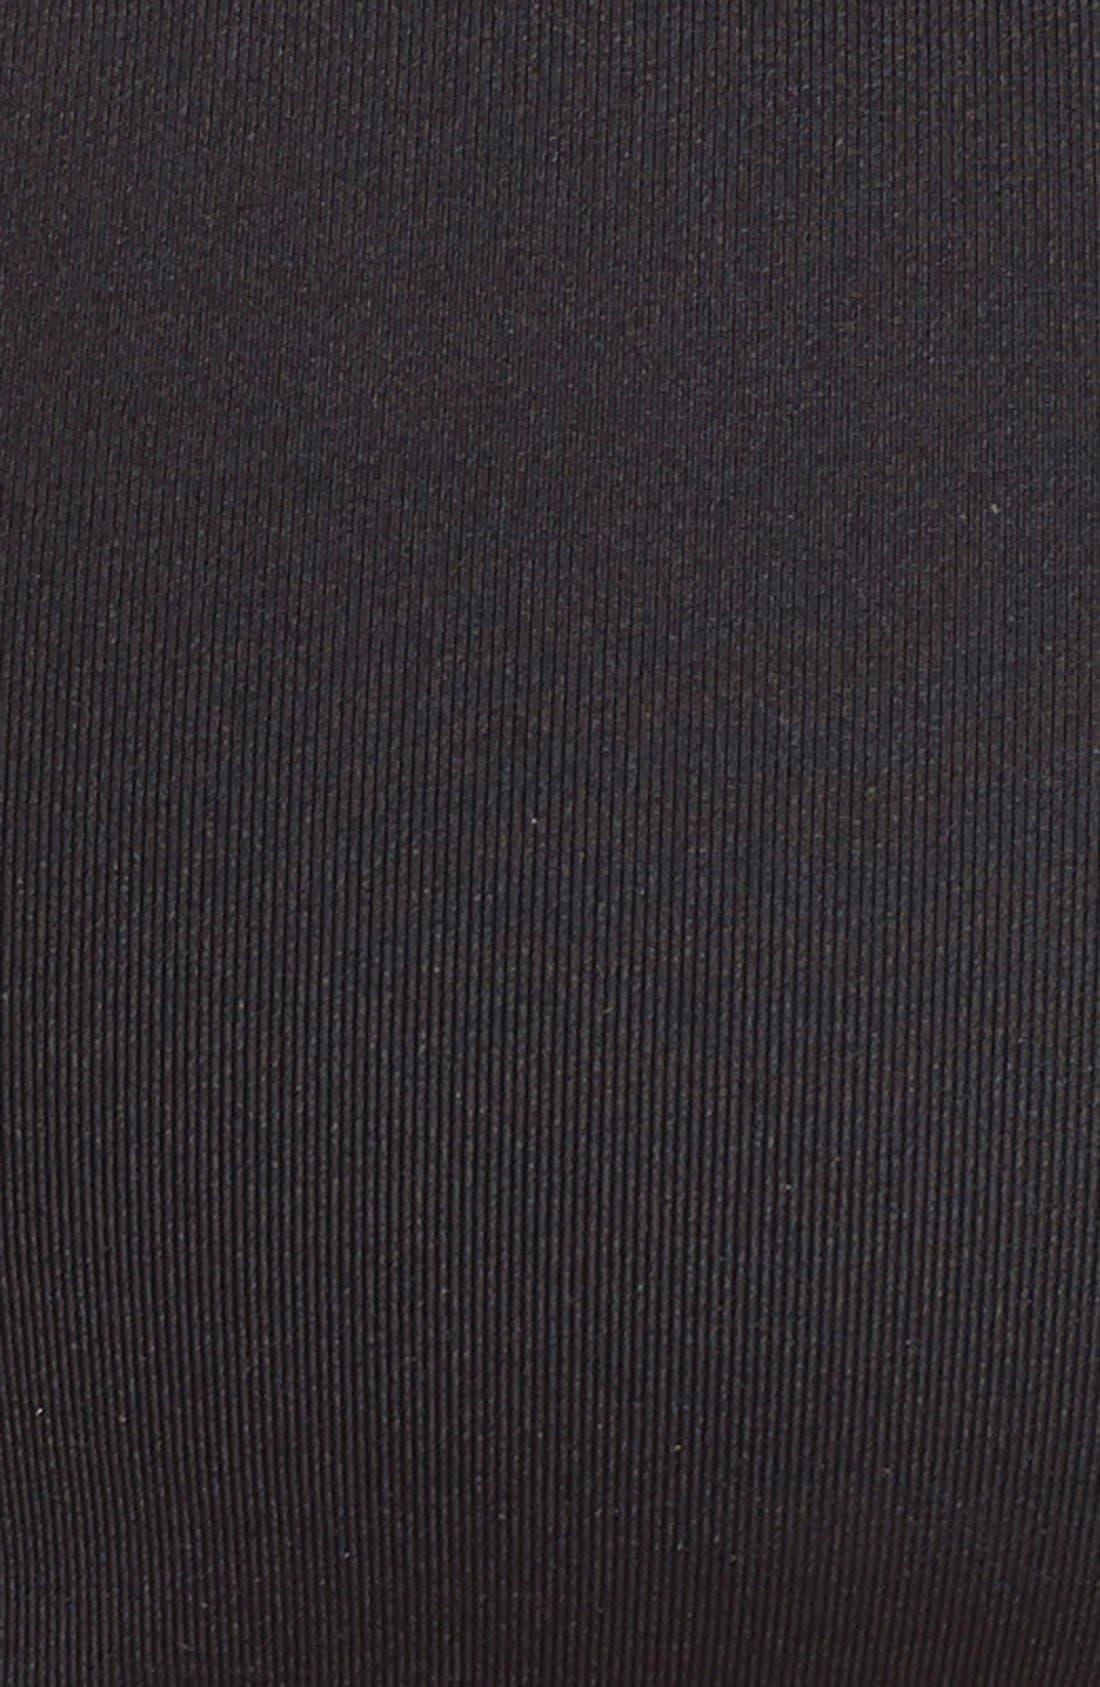 Alternate Image 3  - L Space Jaime Bikini Top